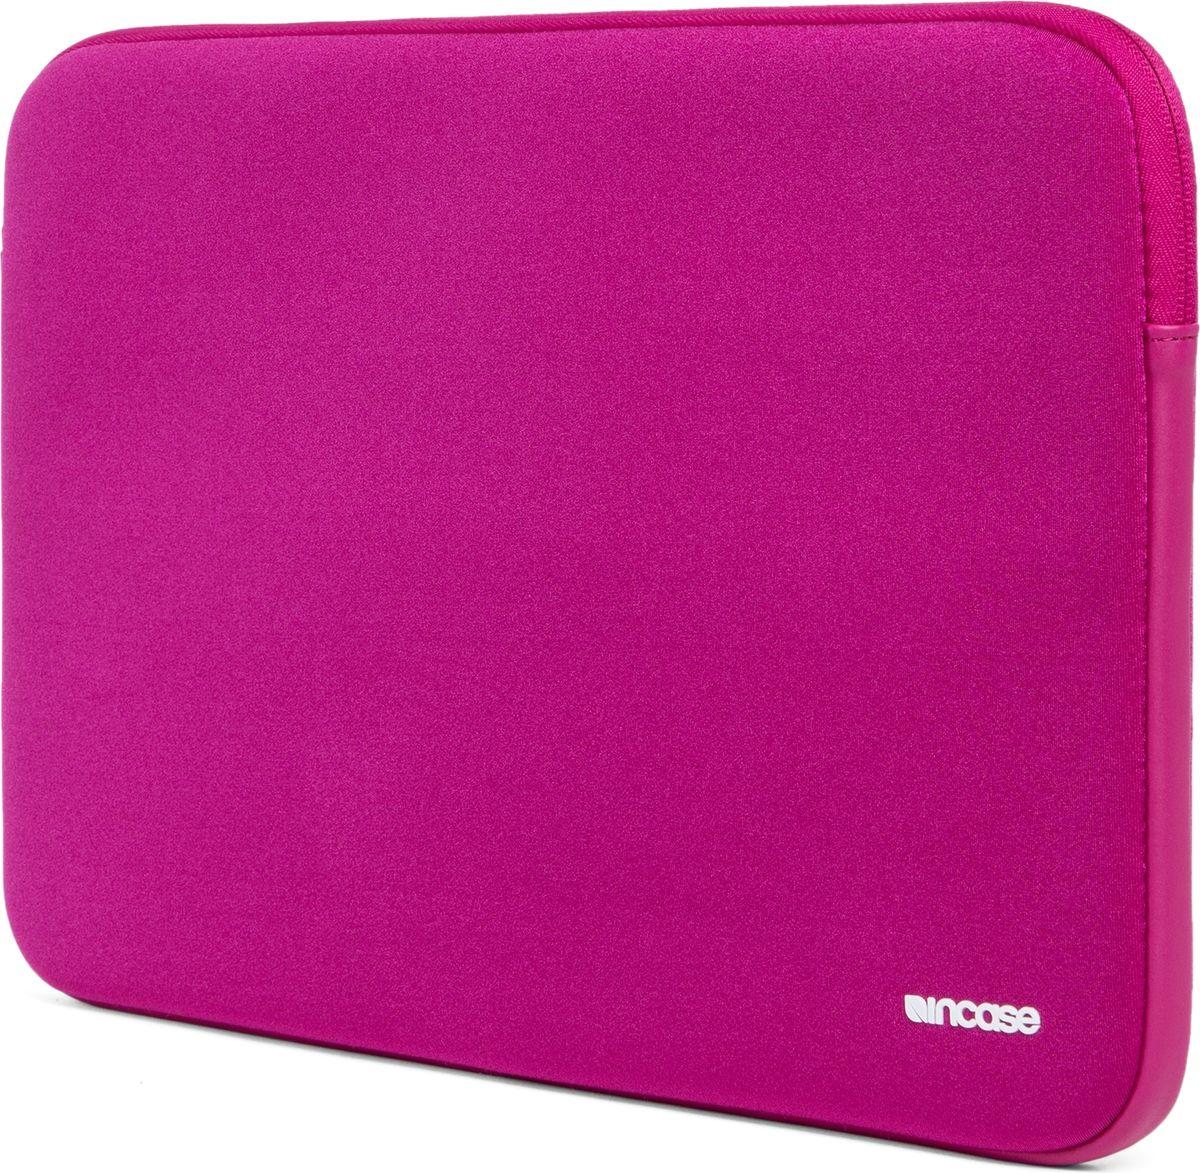 "Incase Neoprene Classic Sleeve чехол для Apple MacBook 15"", Pink Sapphire CL60674"